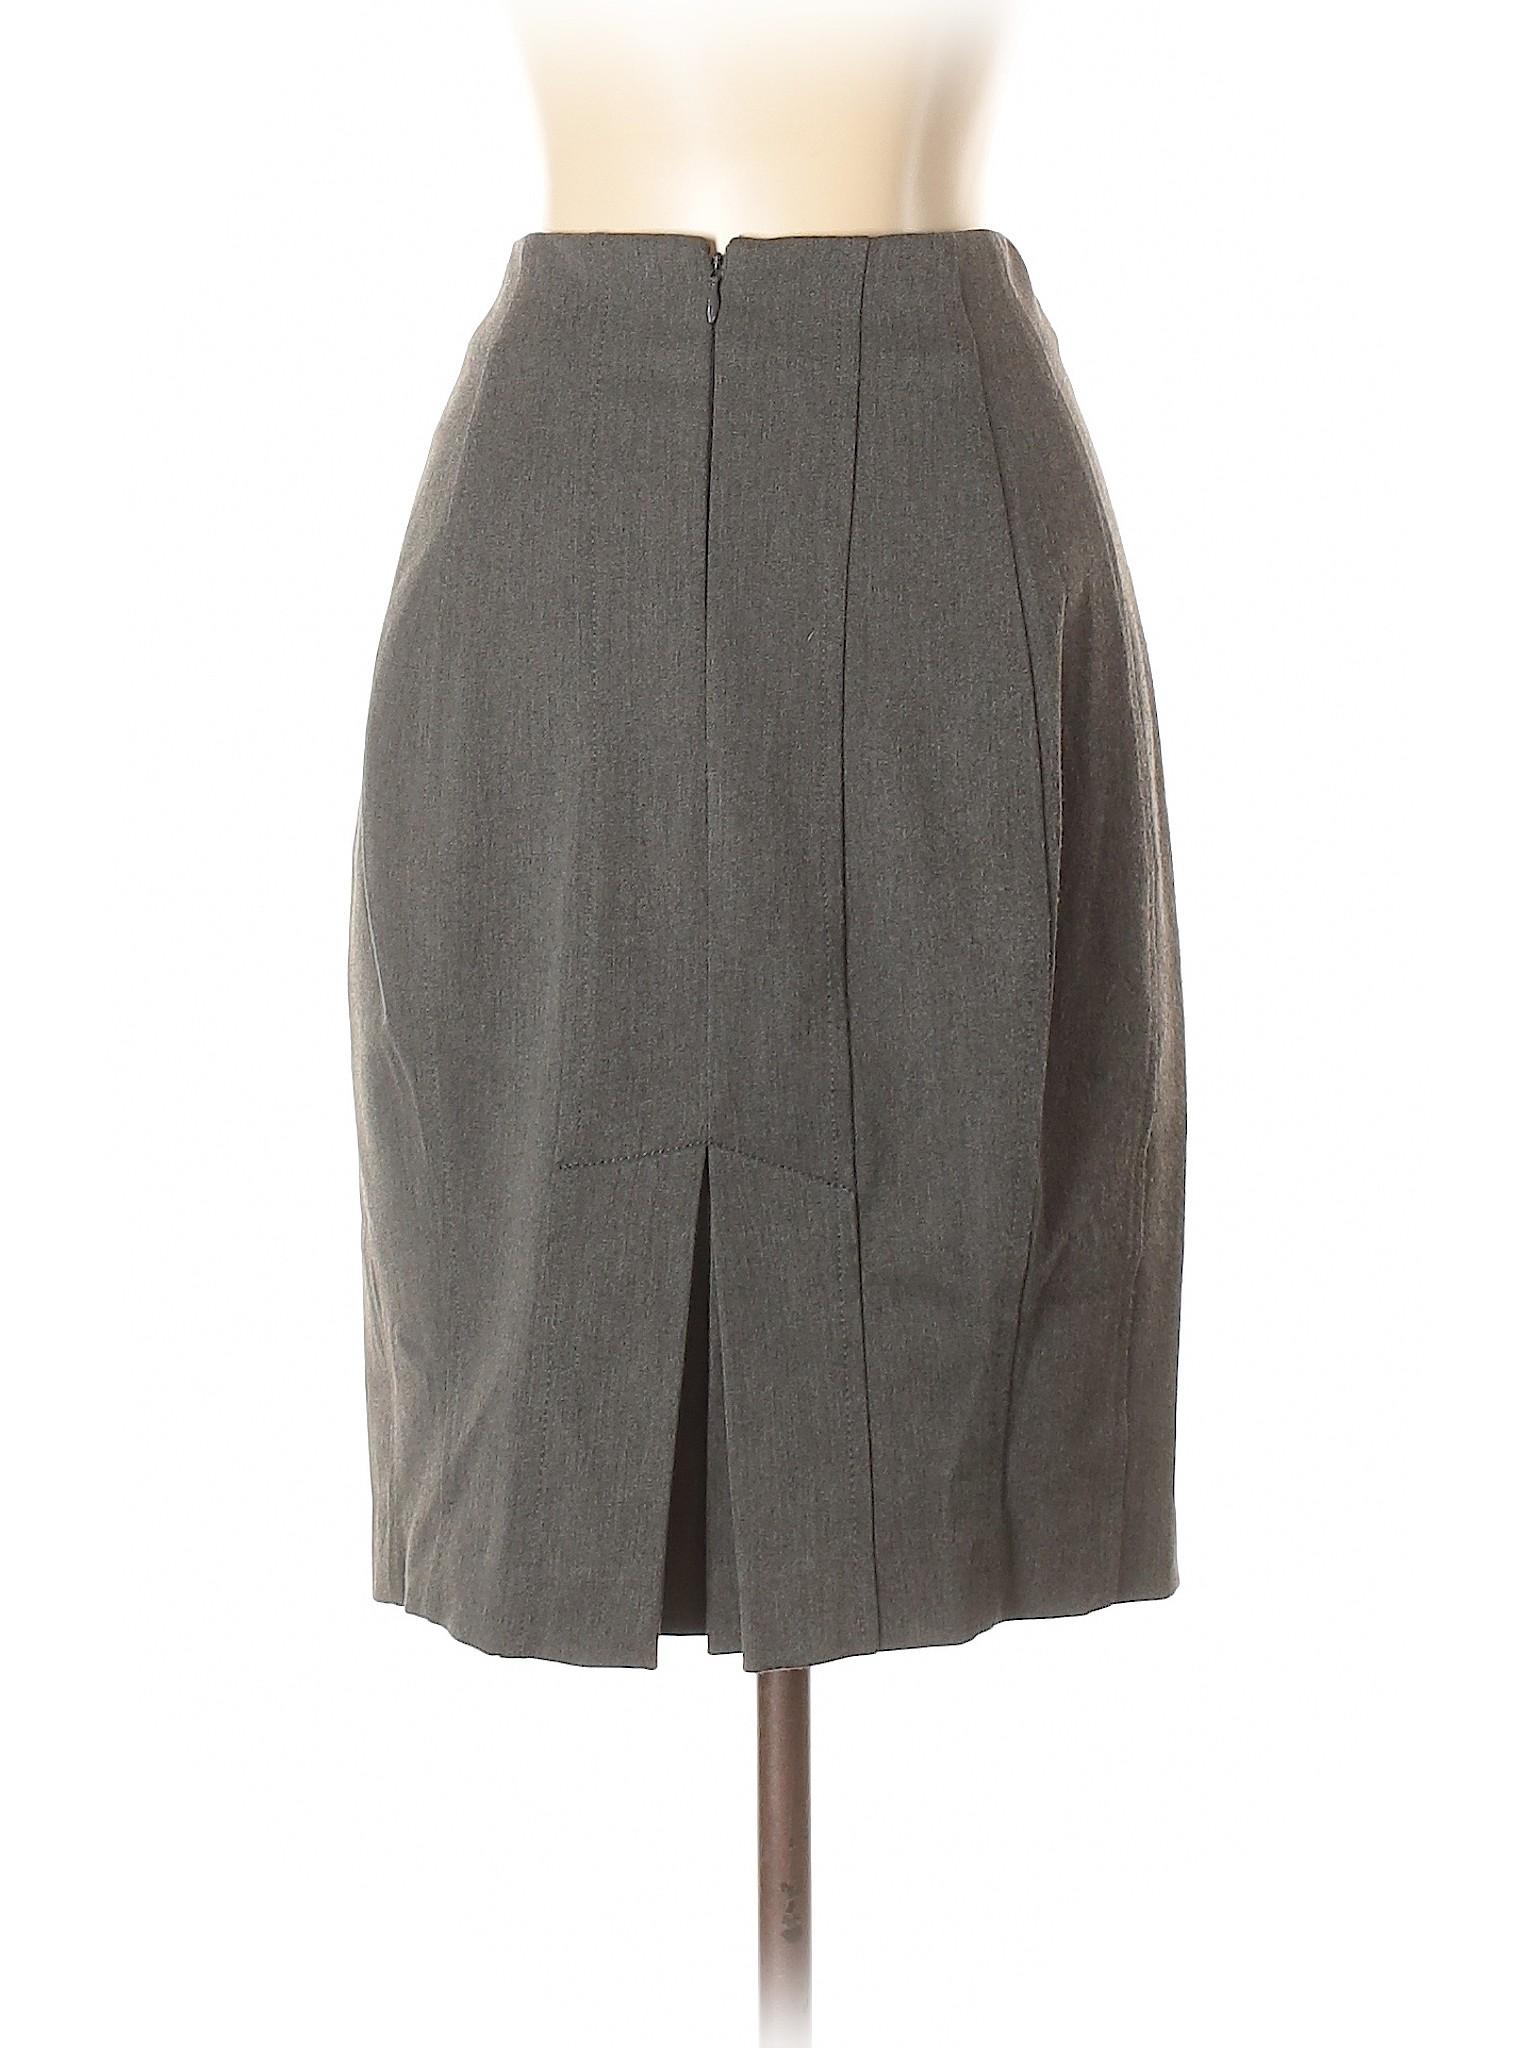 Boutique leisure Express Boutique Skirt leisure Casual wfxdY4rgxq